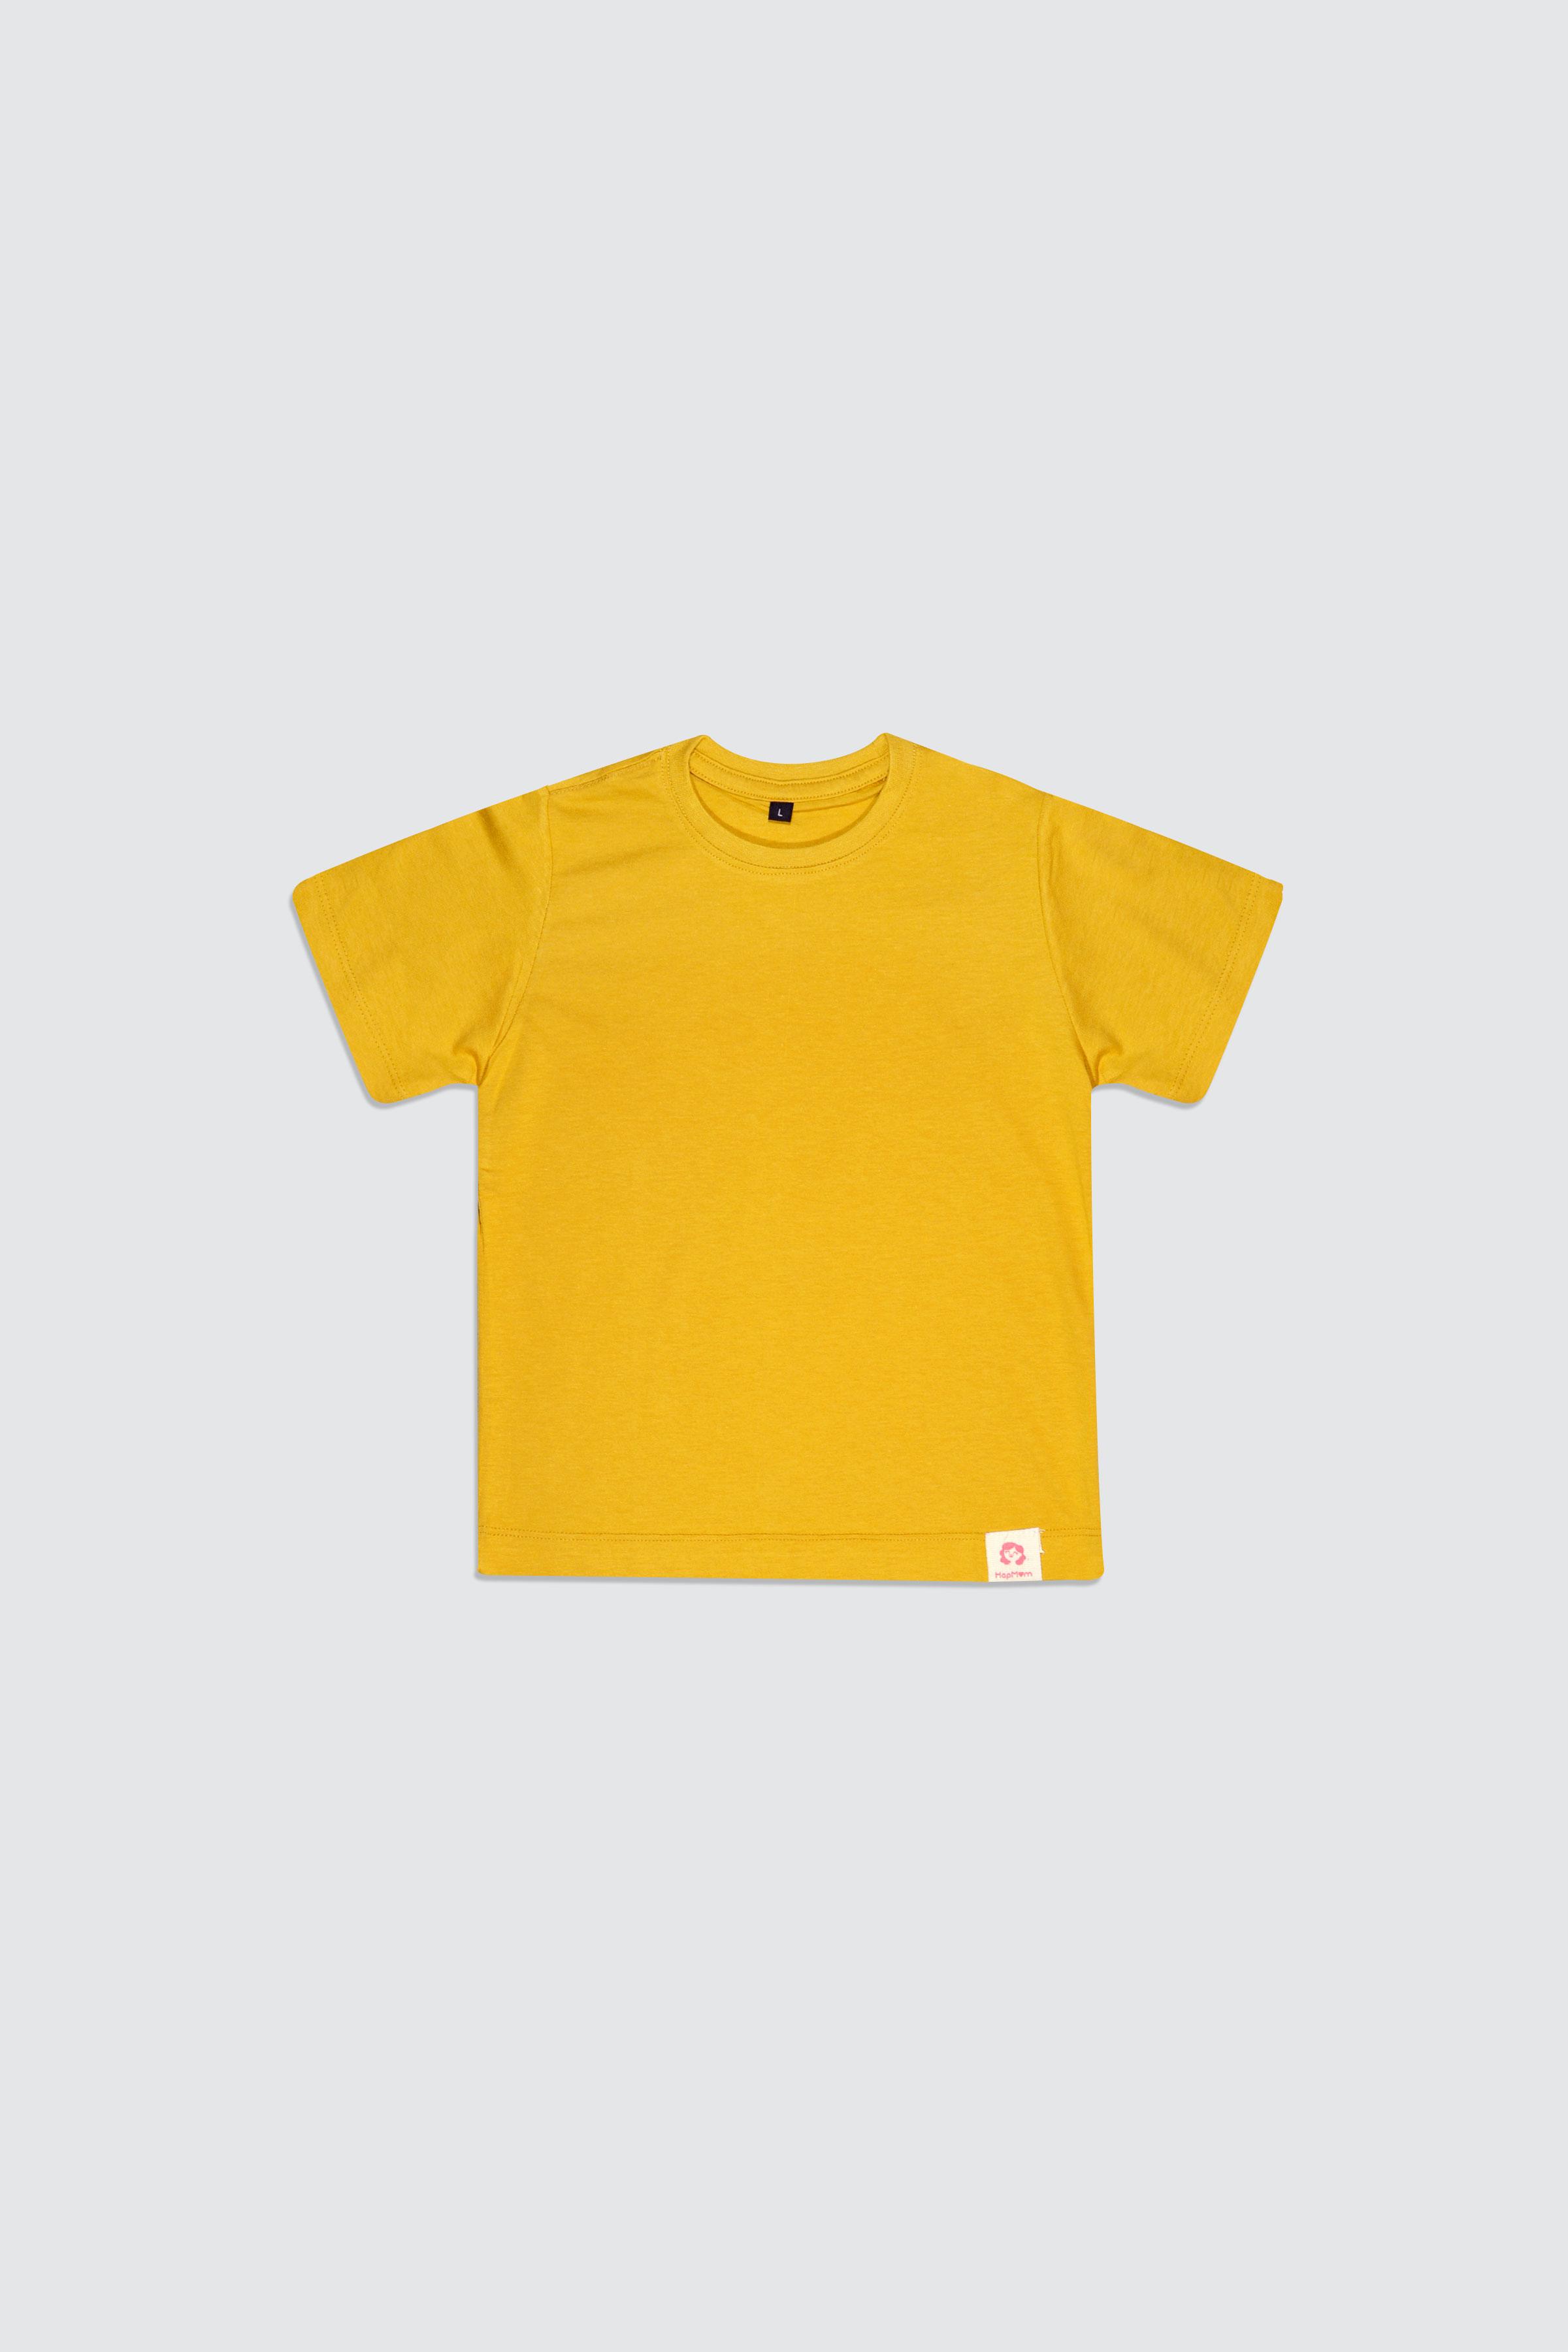 Blank Mustard Front 2